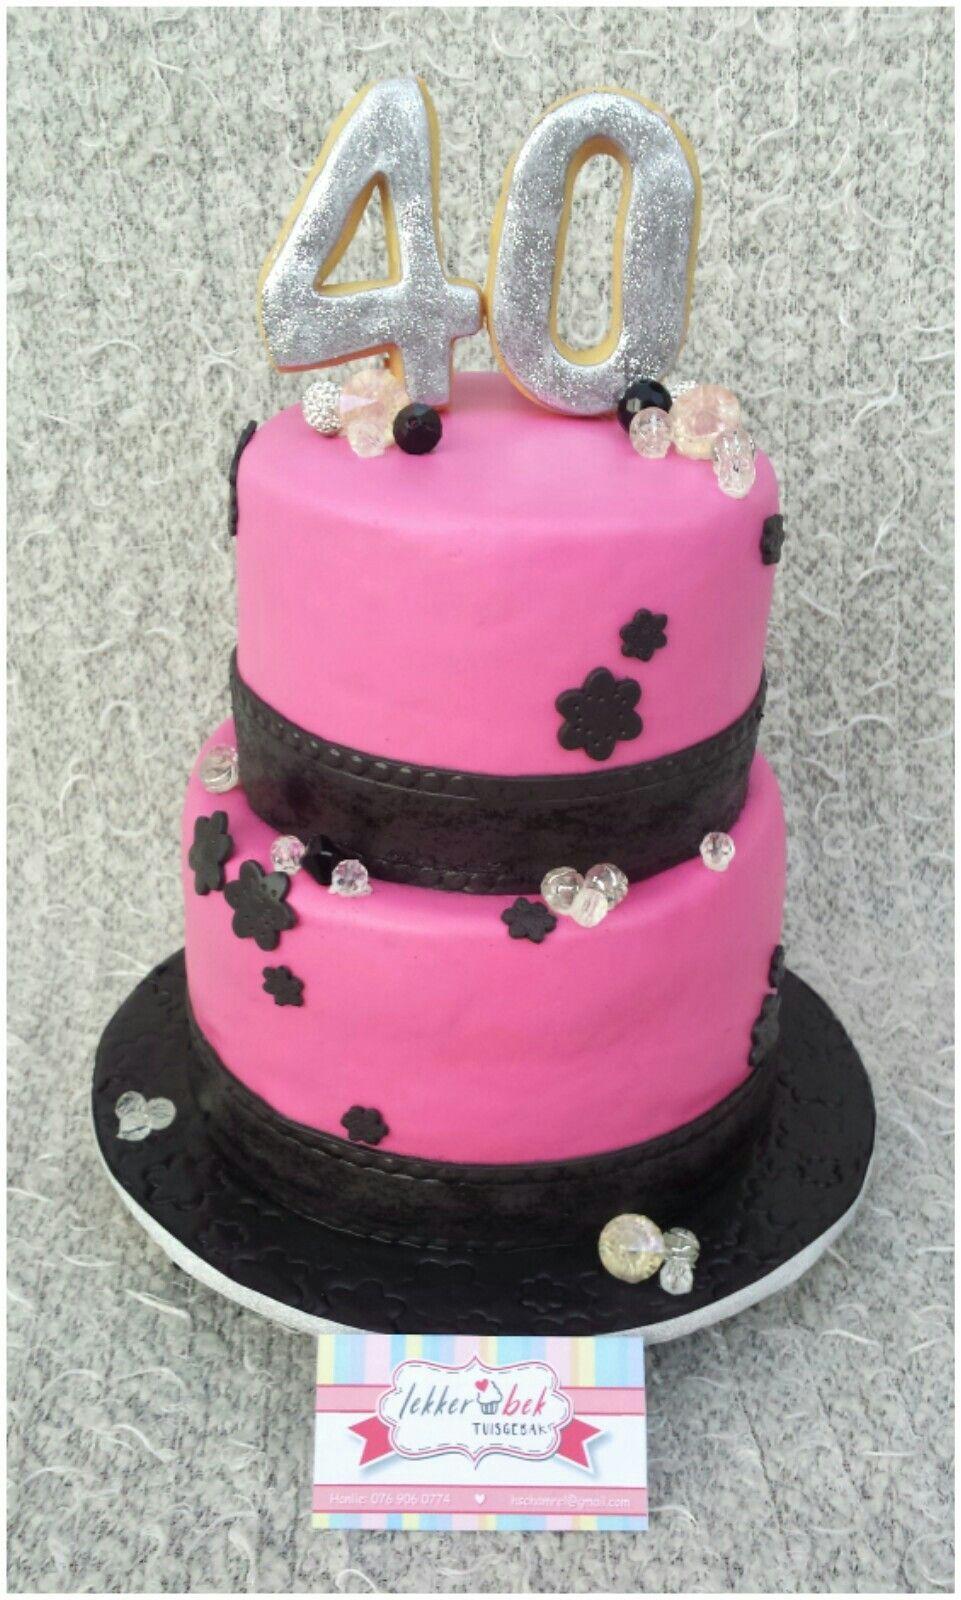 4th Birthday Cake Hot Pink And Black 2tier Lekkerbek Pinterest